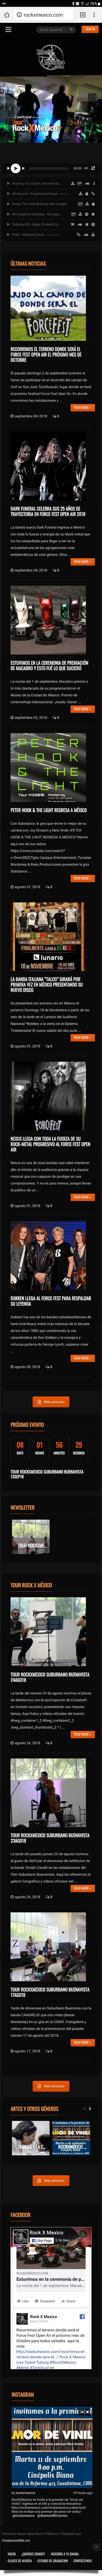 Rock X México - Diseño de Página Web - CreadoresWeb.mx